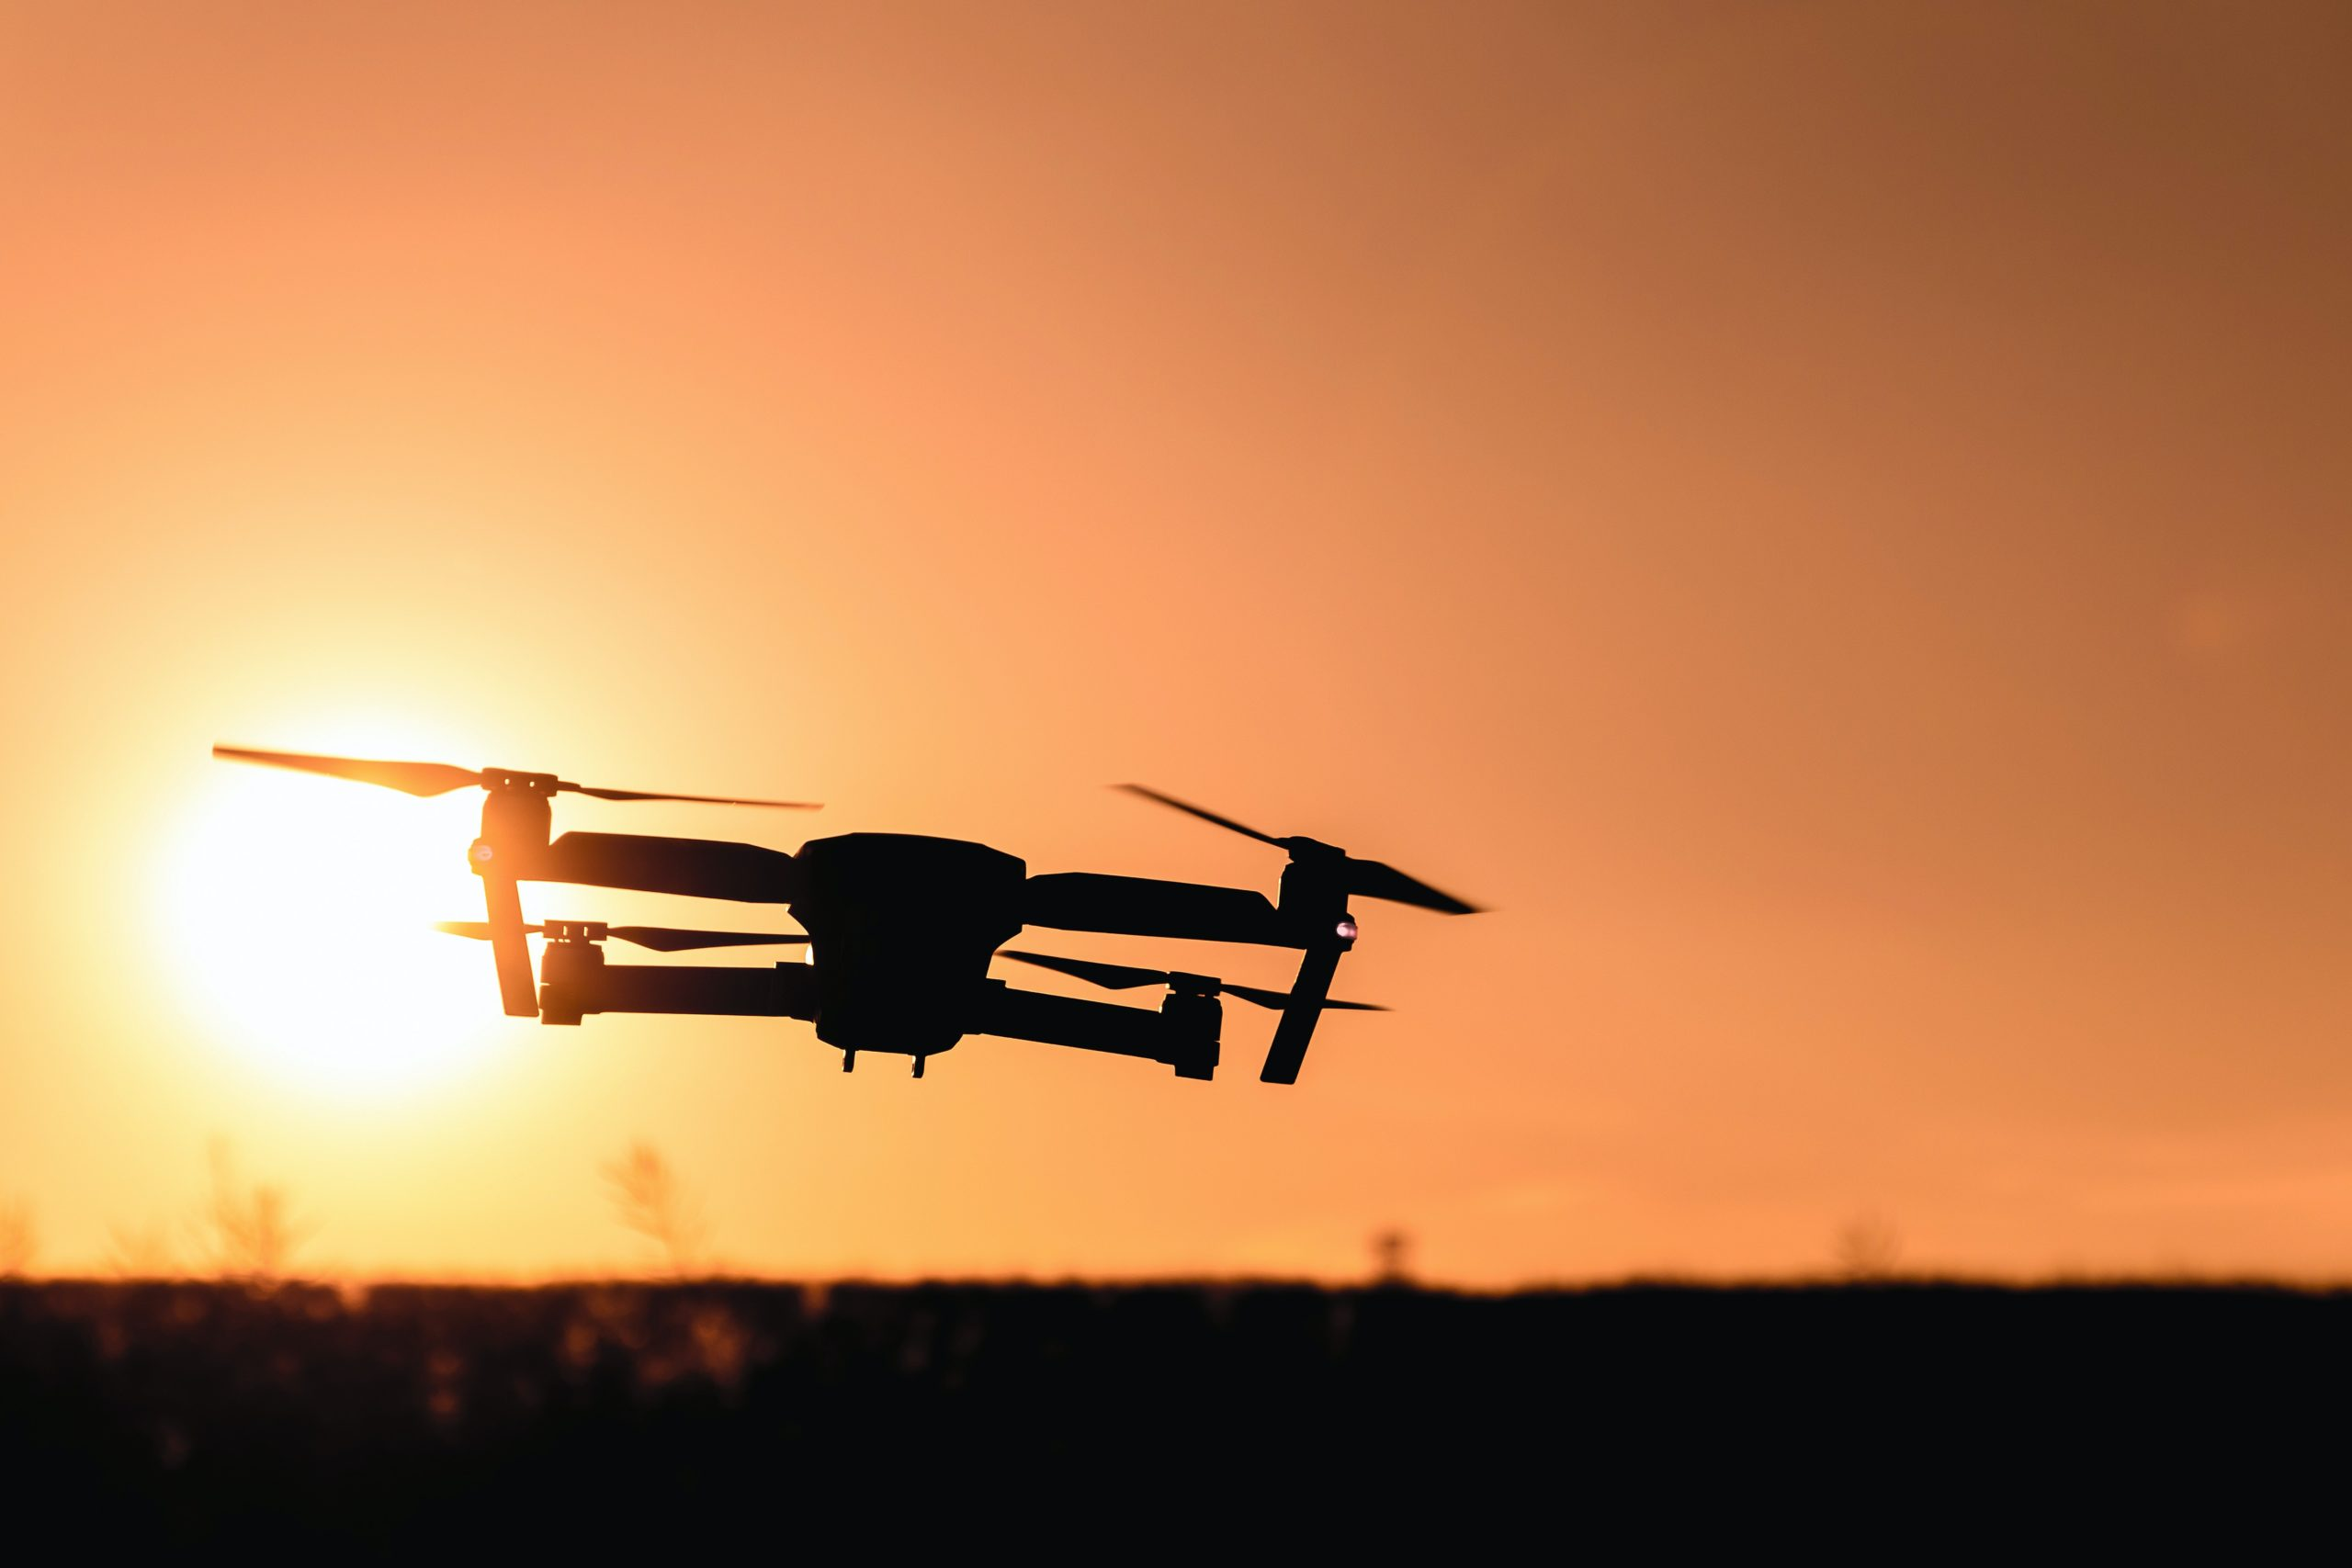 Drones monitorizam a vida selvagem na Austrália